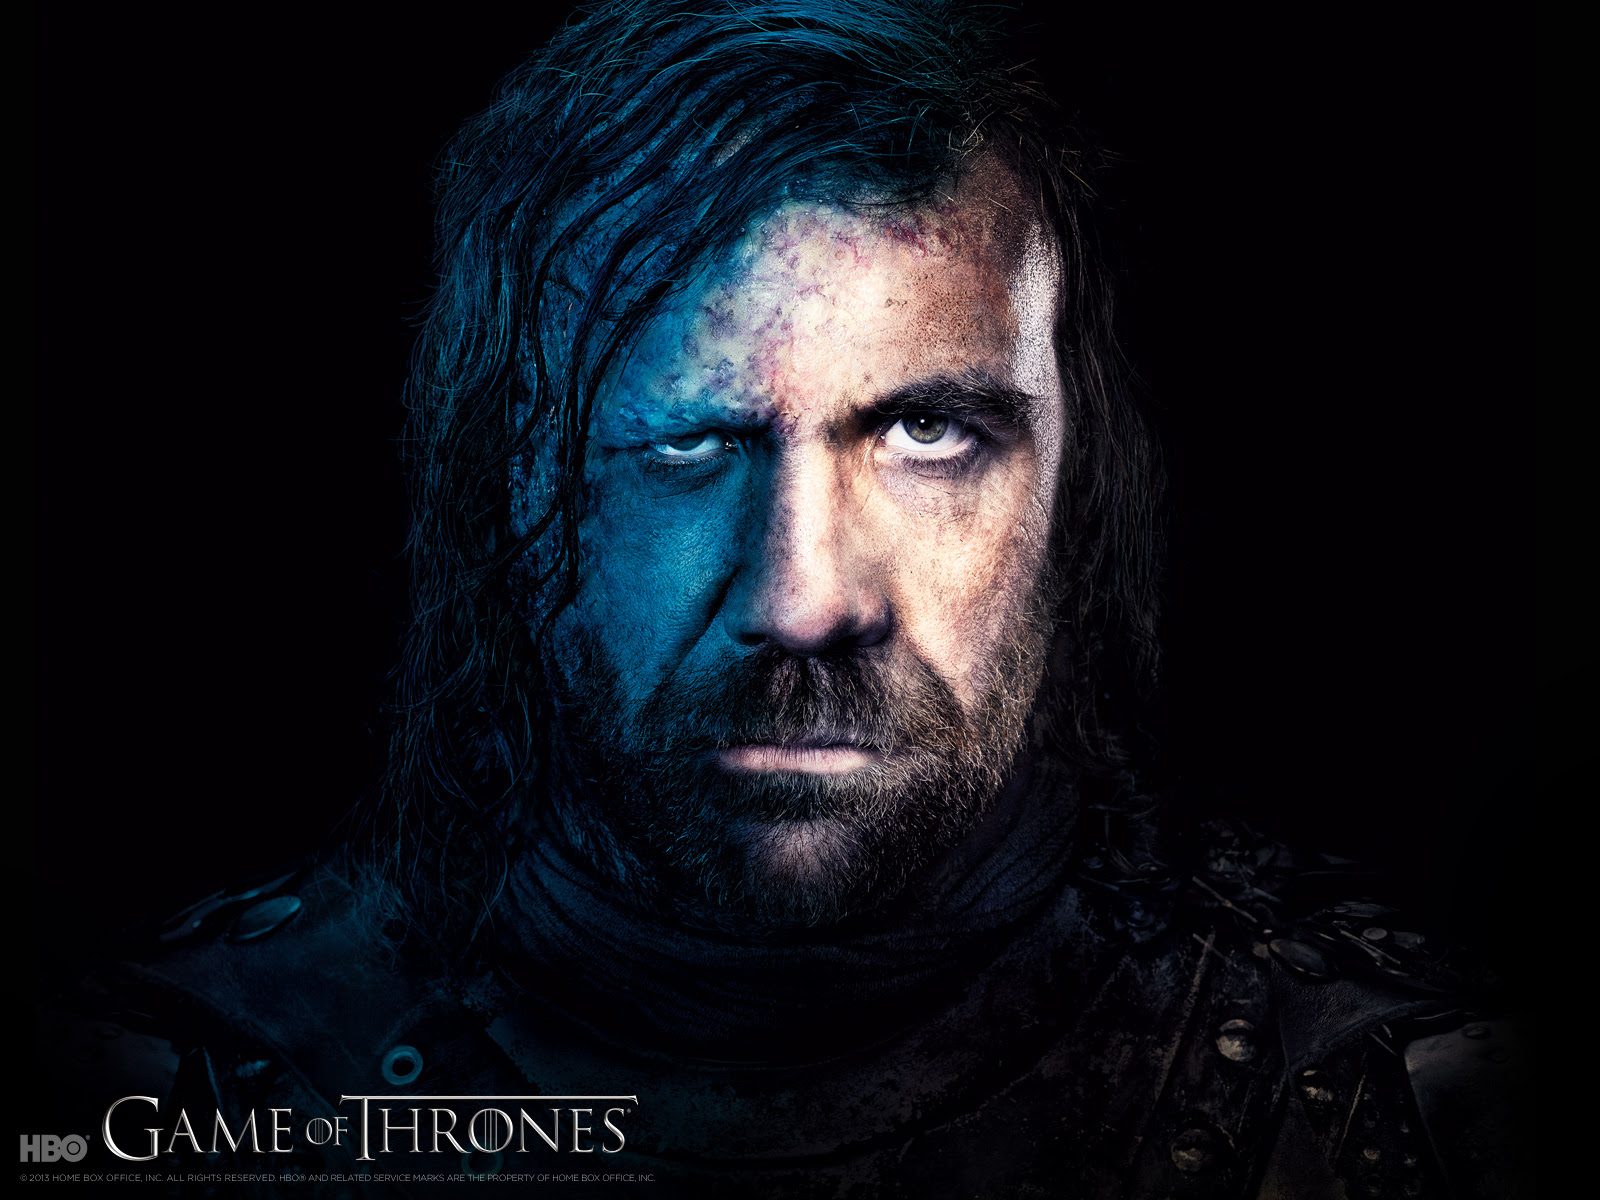 Sandor Clegane Game Of Thrones Wallpaper 33779425 Fanpop